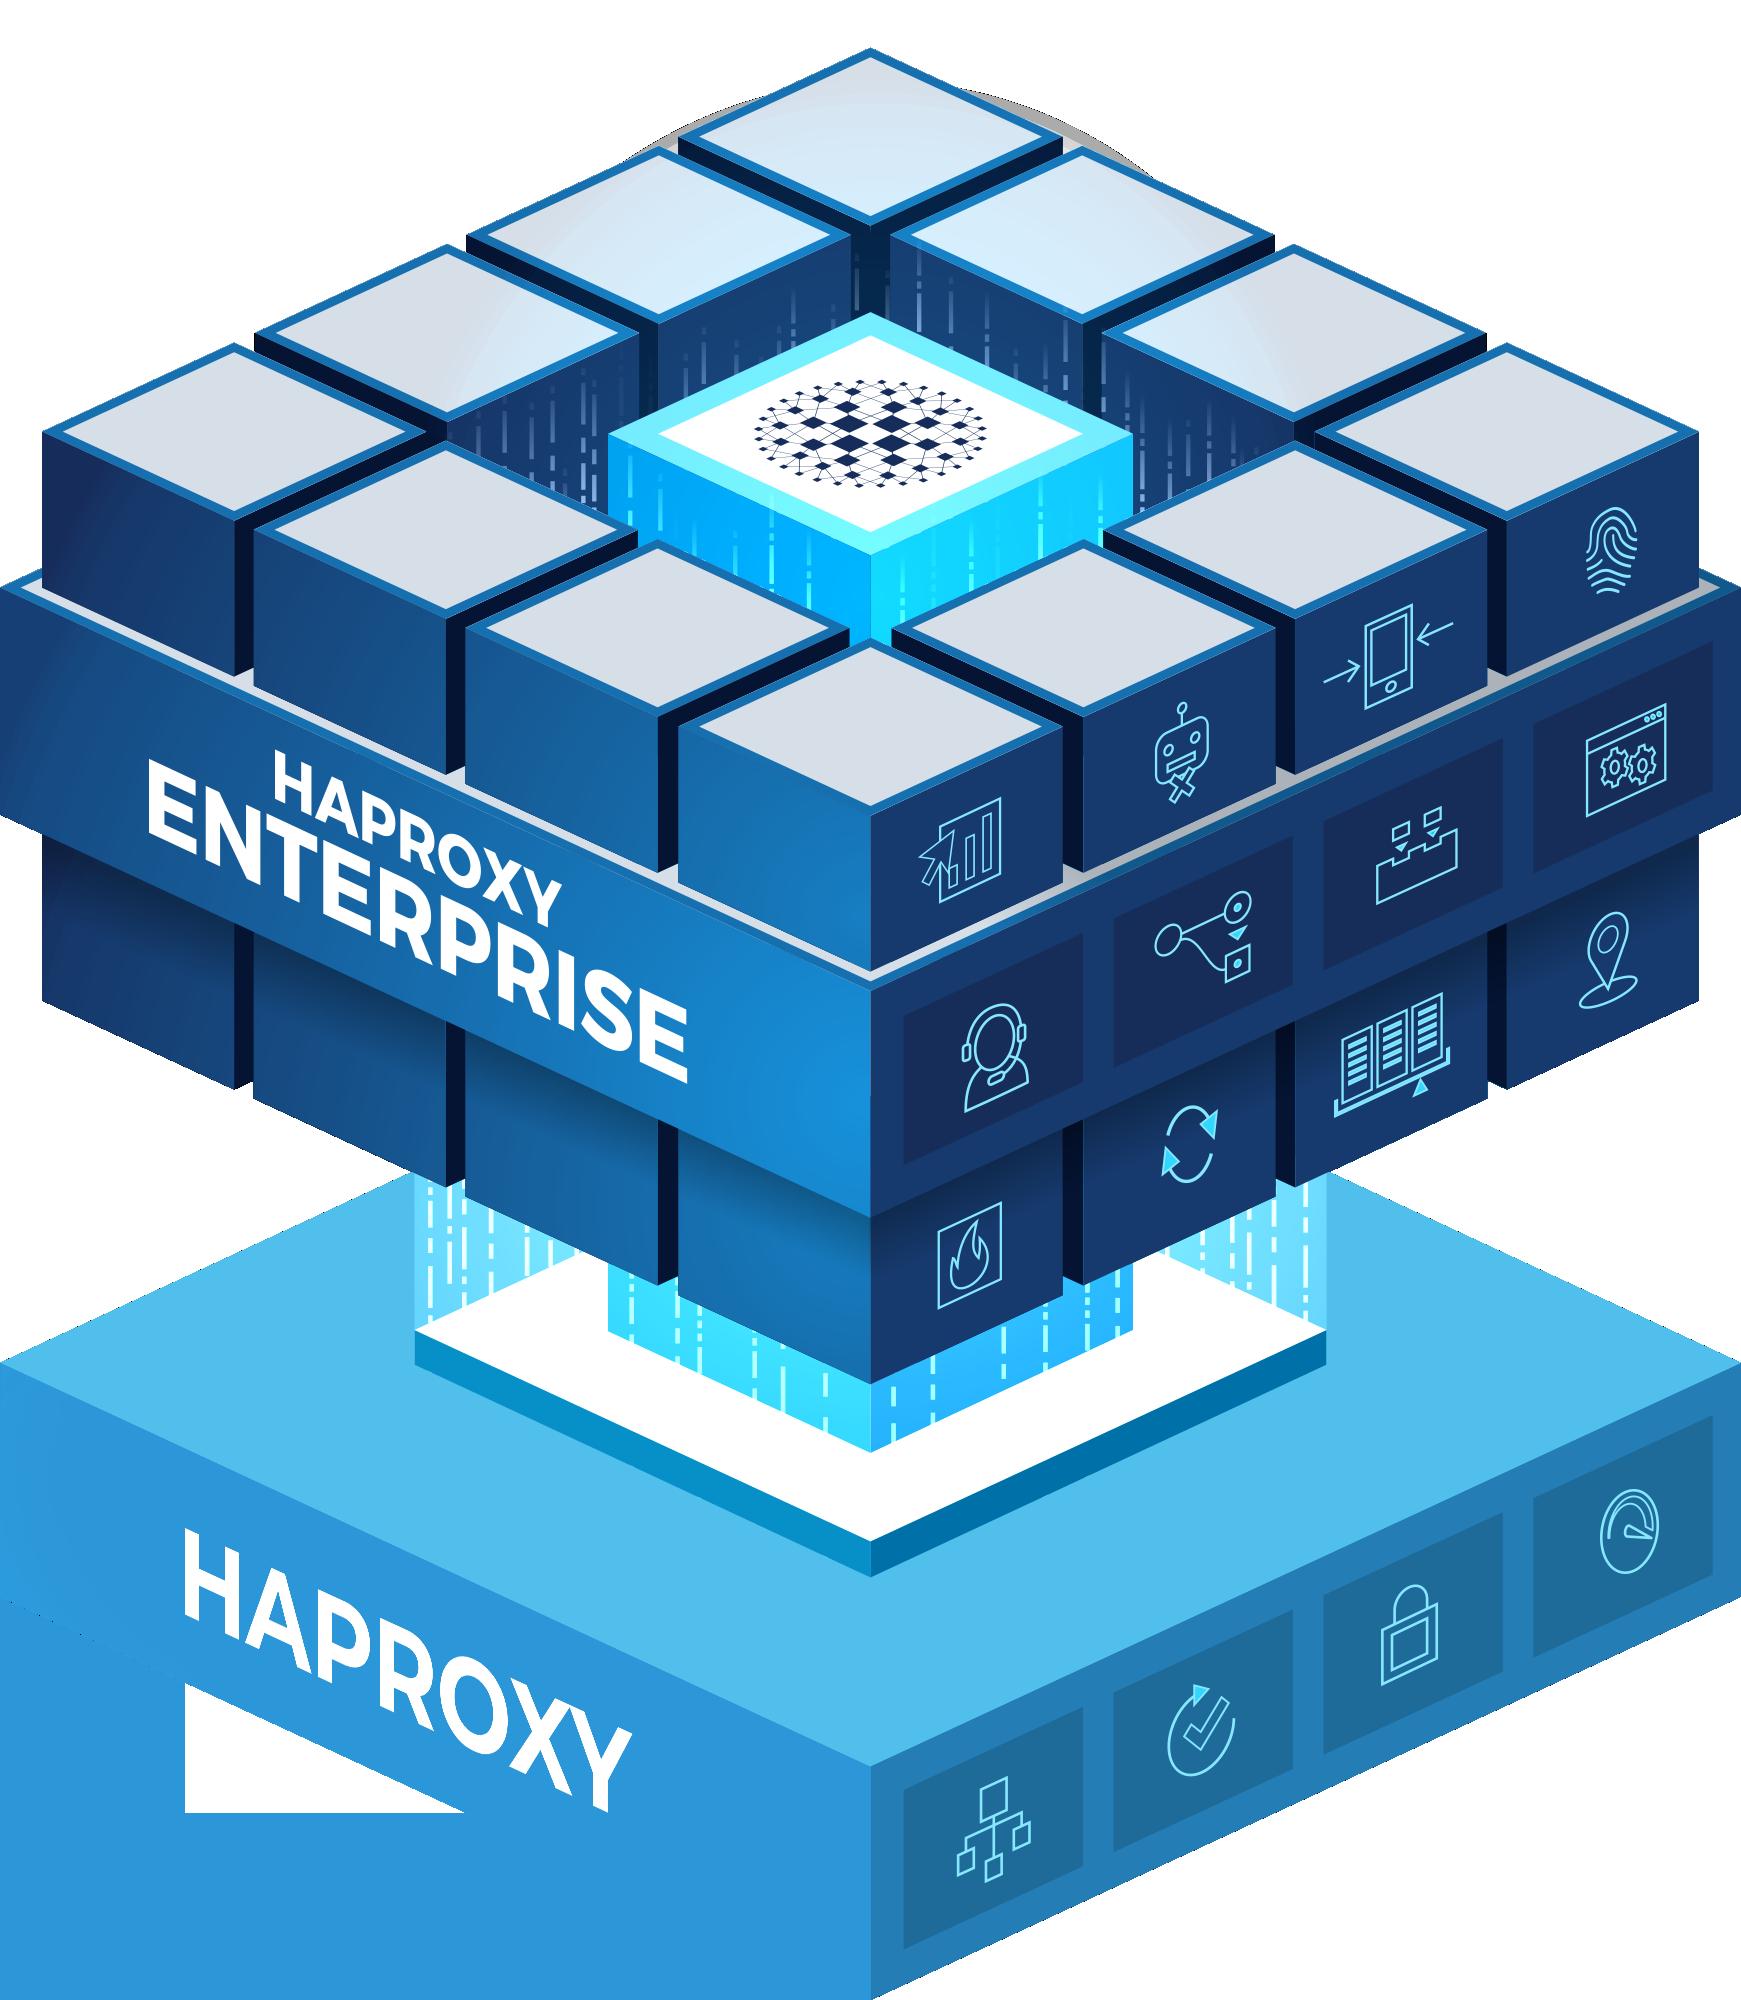 HAProxy Enterprise